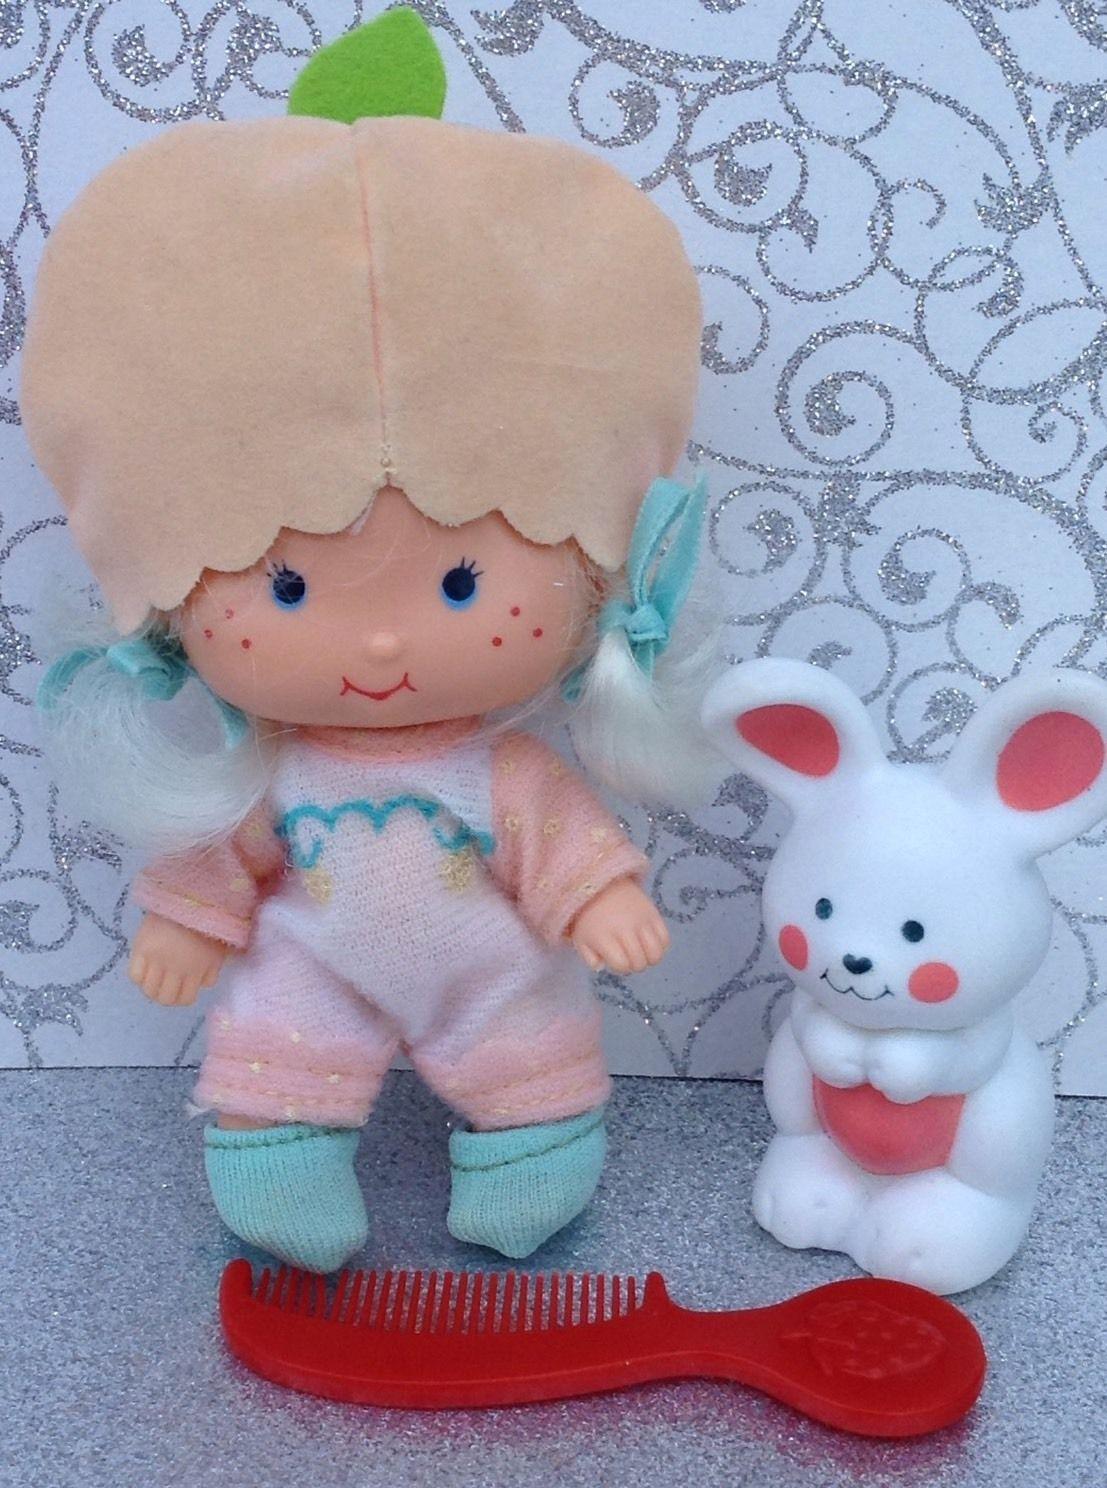 Vintage Strawberry Shortcake Doll Apricot with Pet Bunny Hopsalot ...